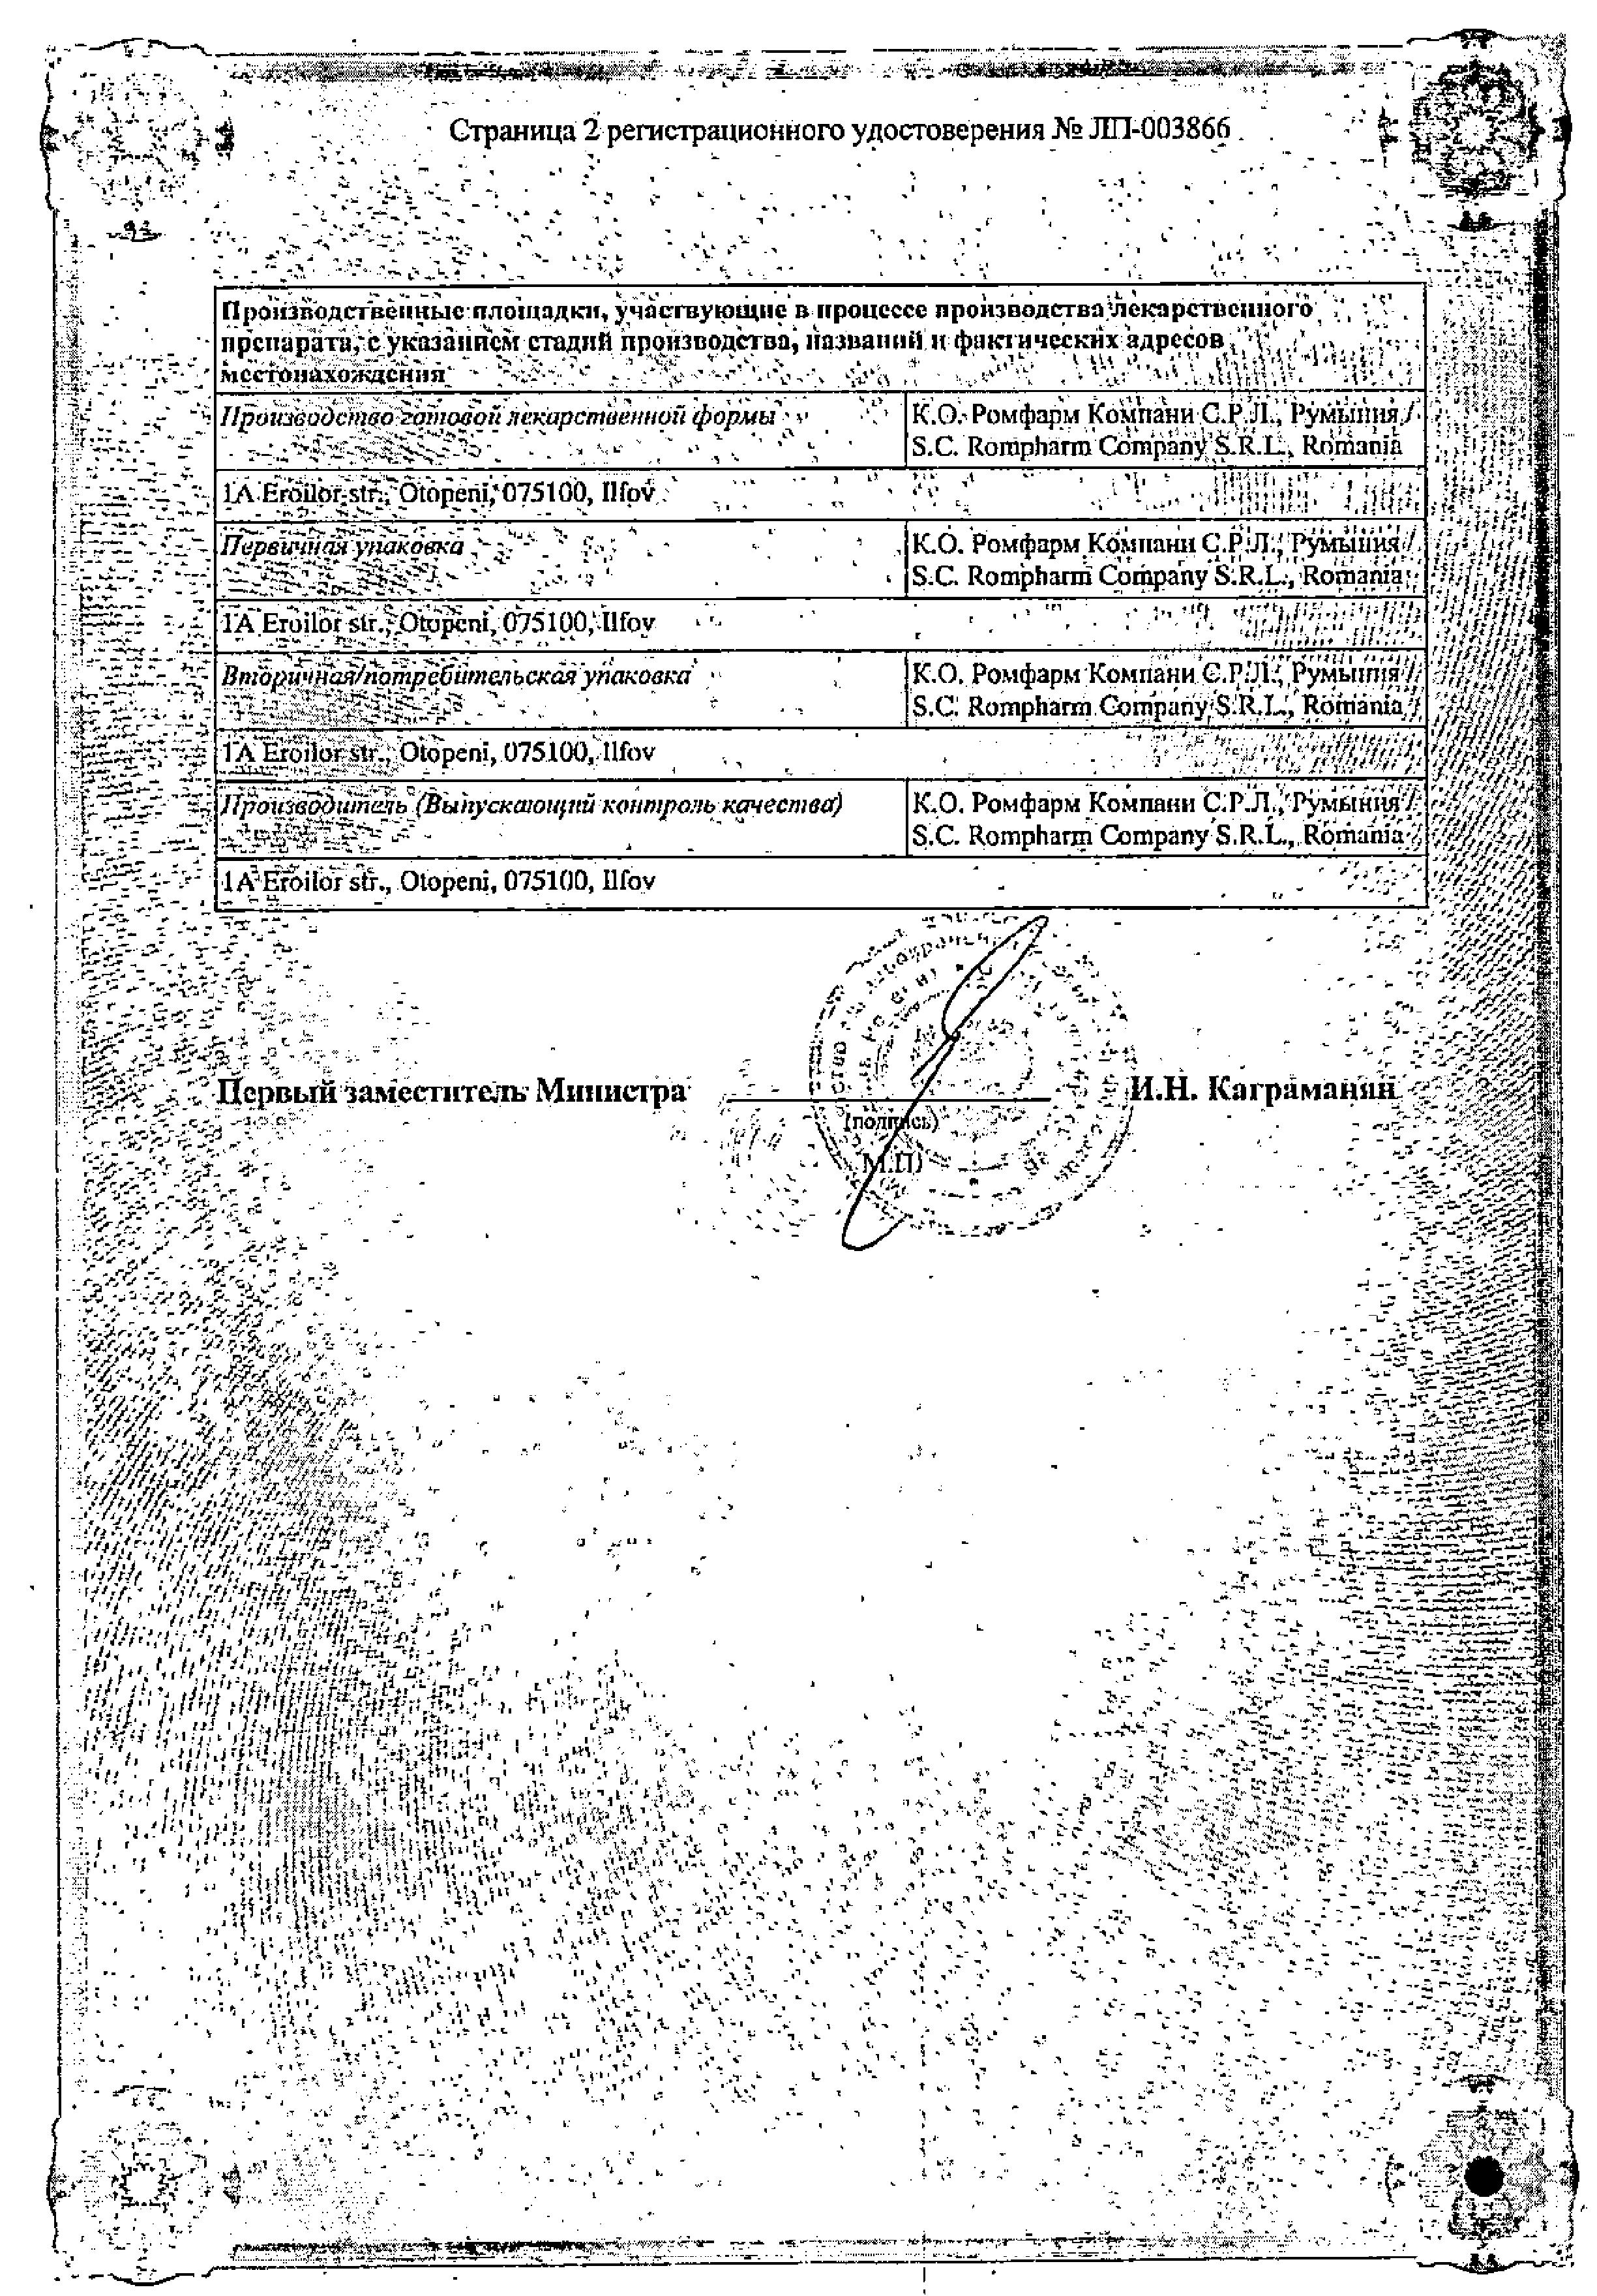 Бринзопт сертификат